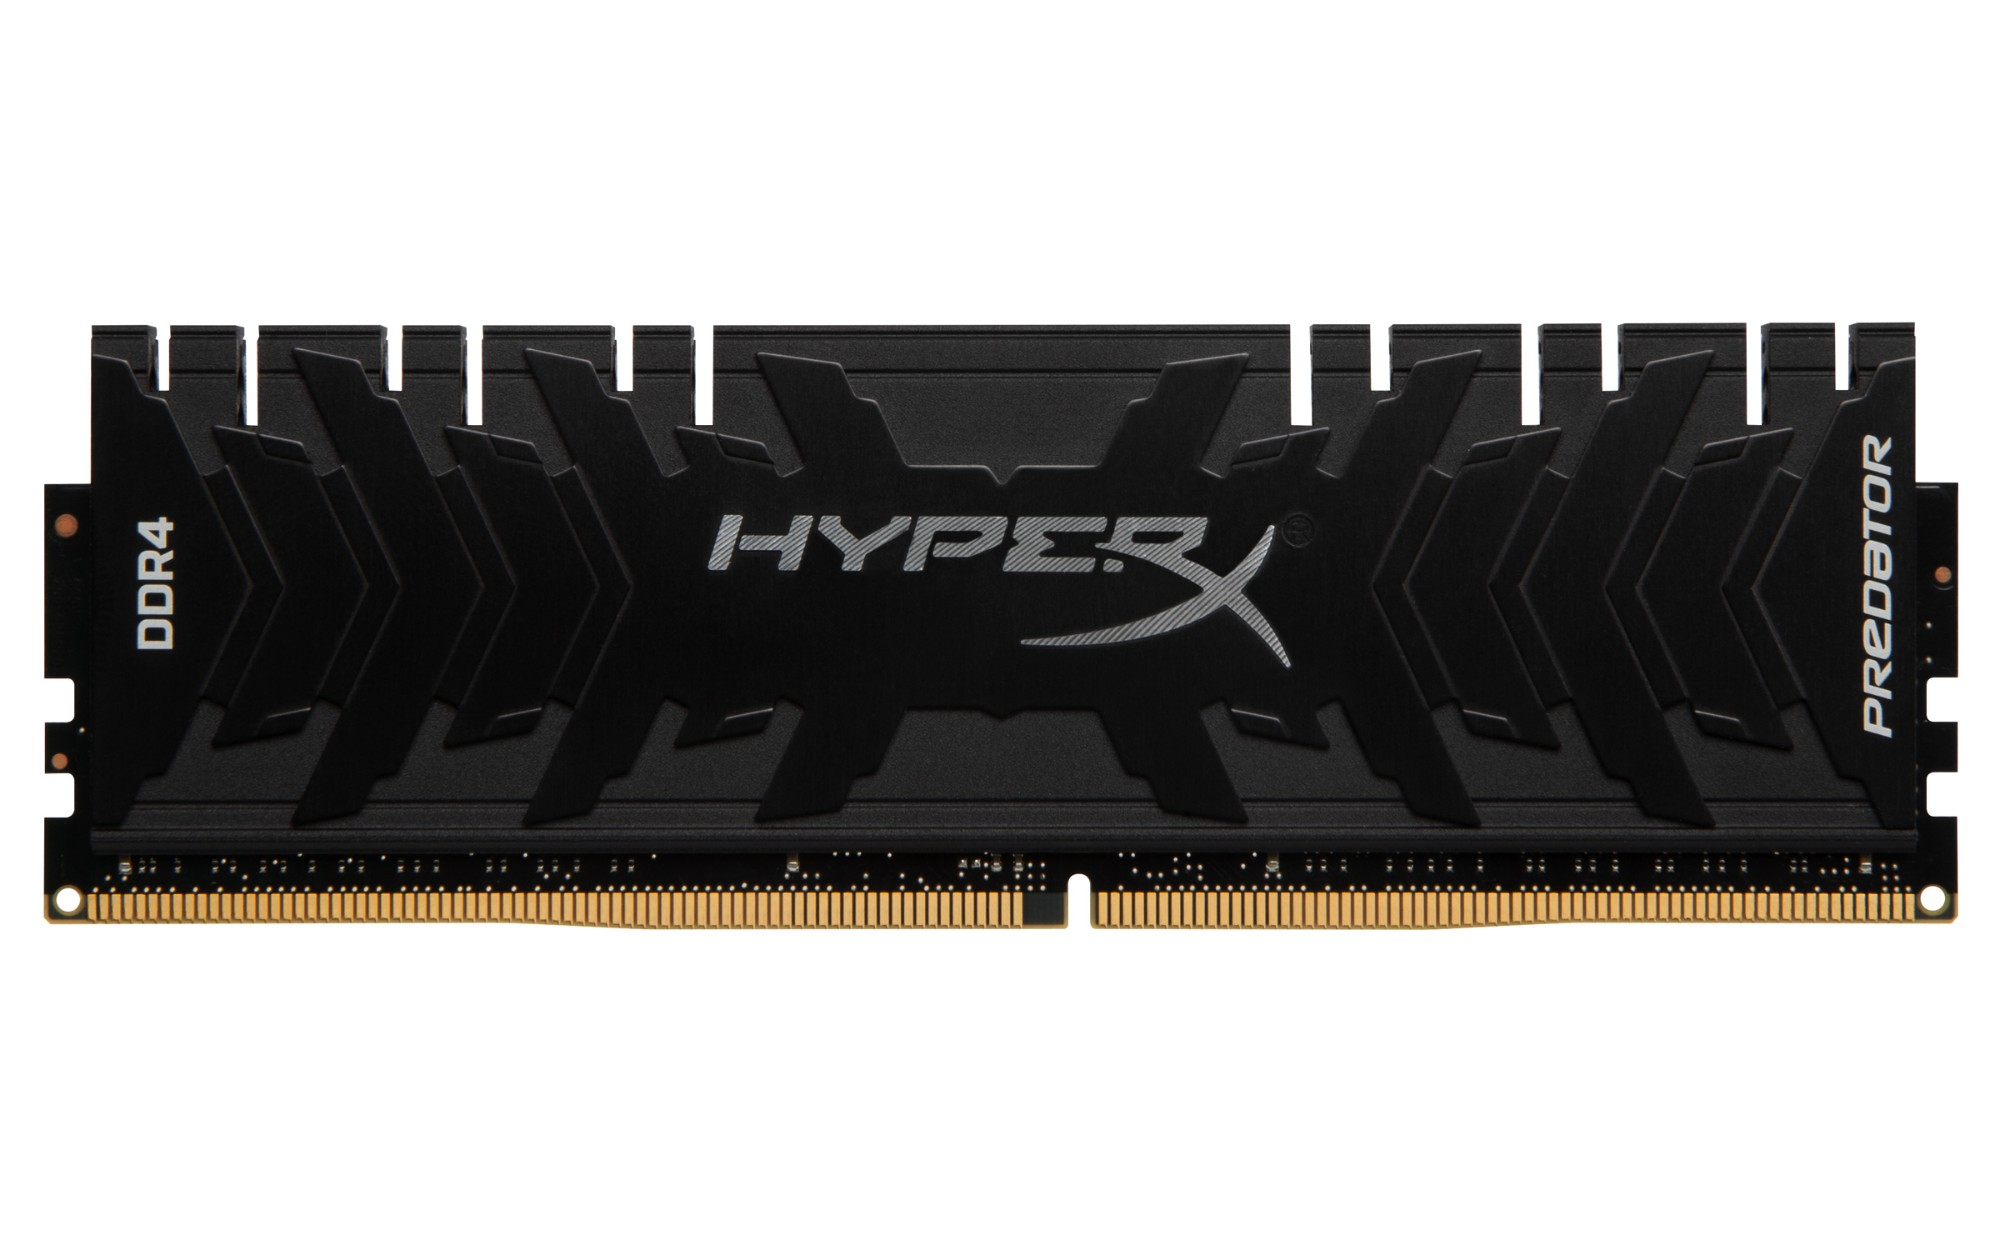 HyperX Predator HX432C16PB3K2/16 módulo de memoria 16 GB 2 x 8 GB DDR4 3200 MHz